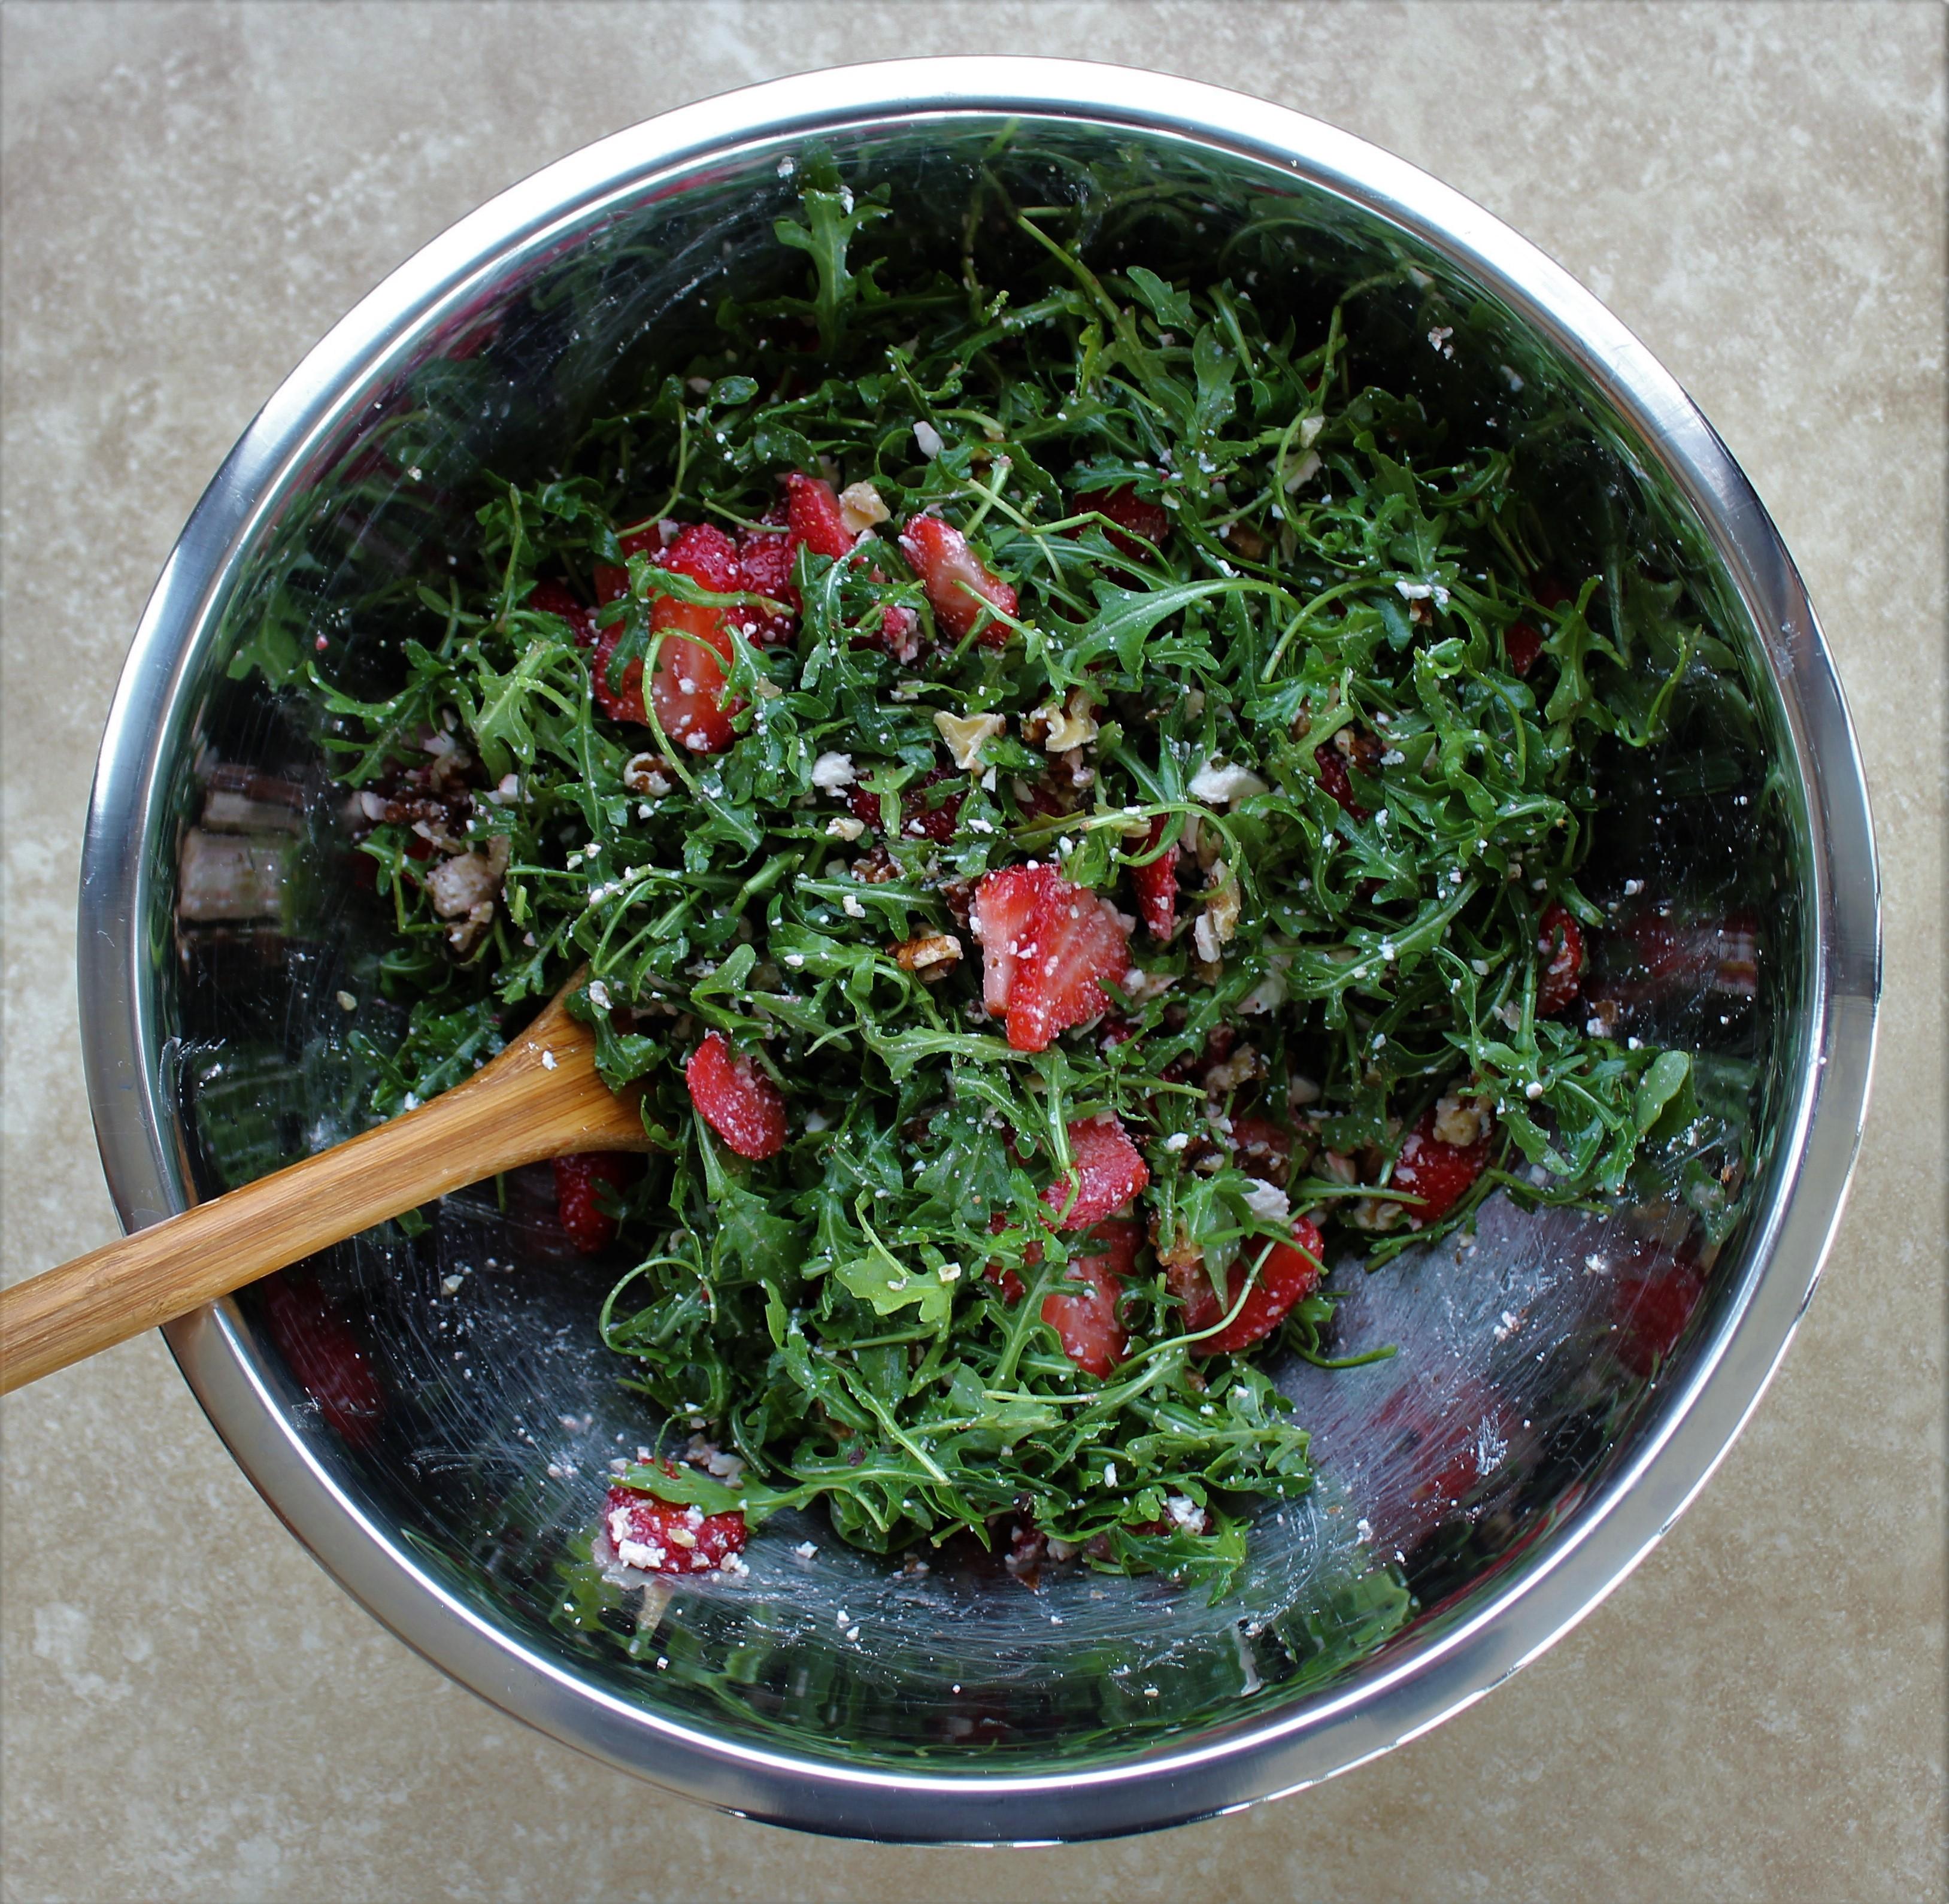 Strawberry Arugula Salad with Blood Orange Vinaigrette 2